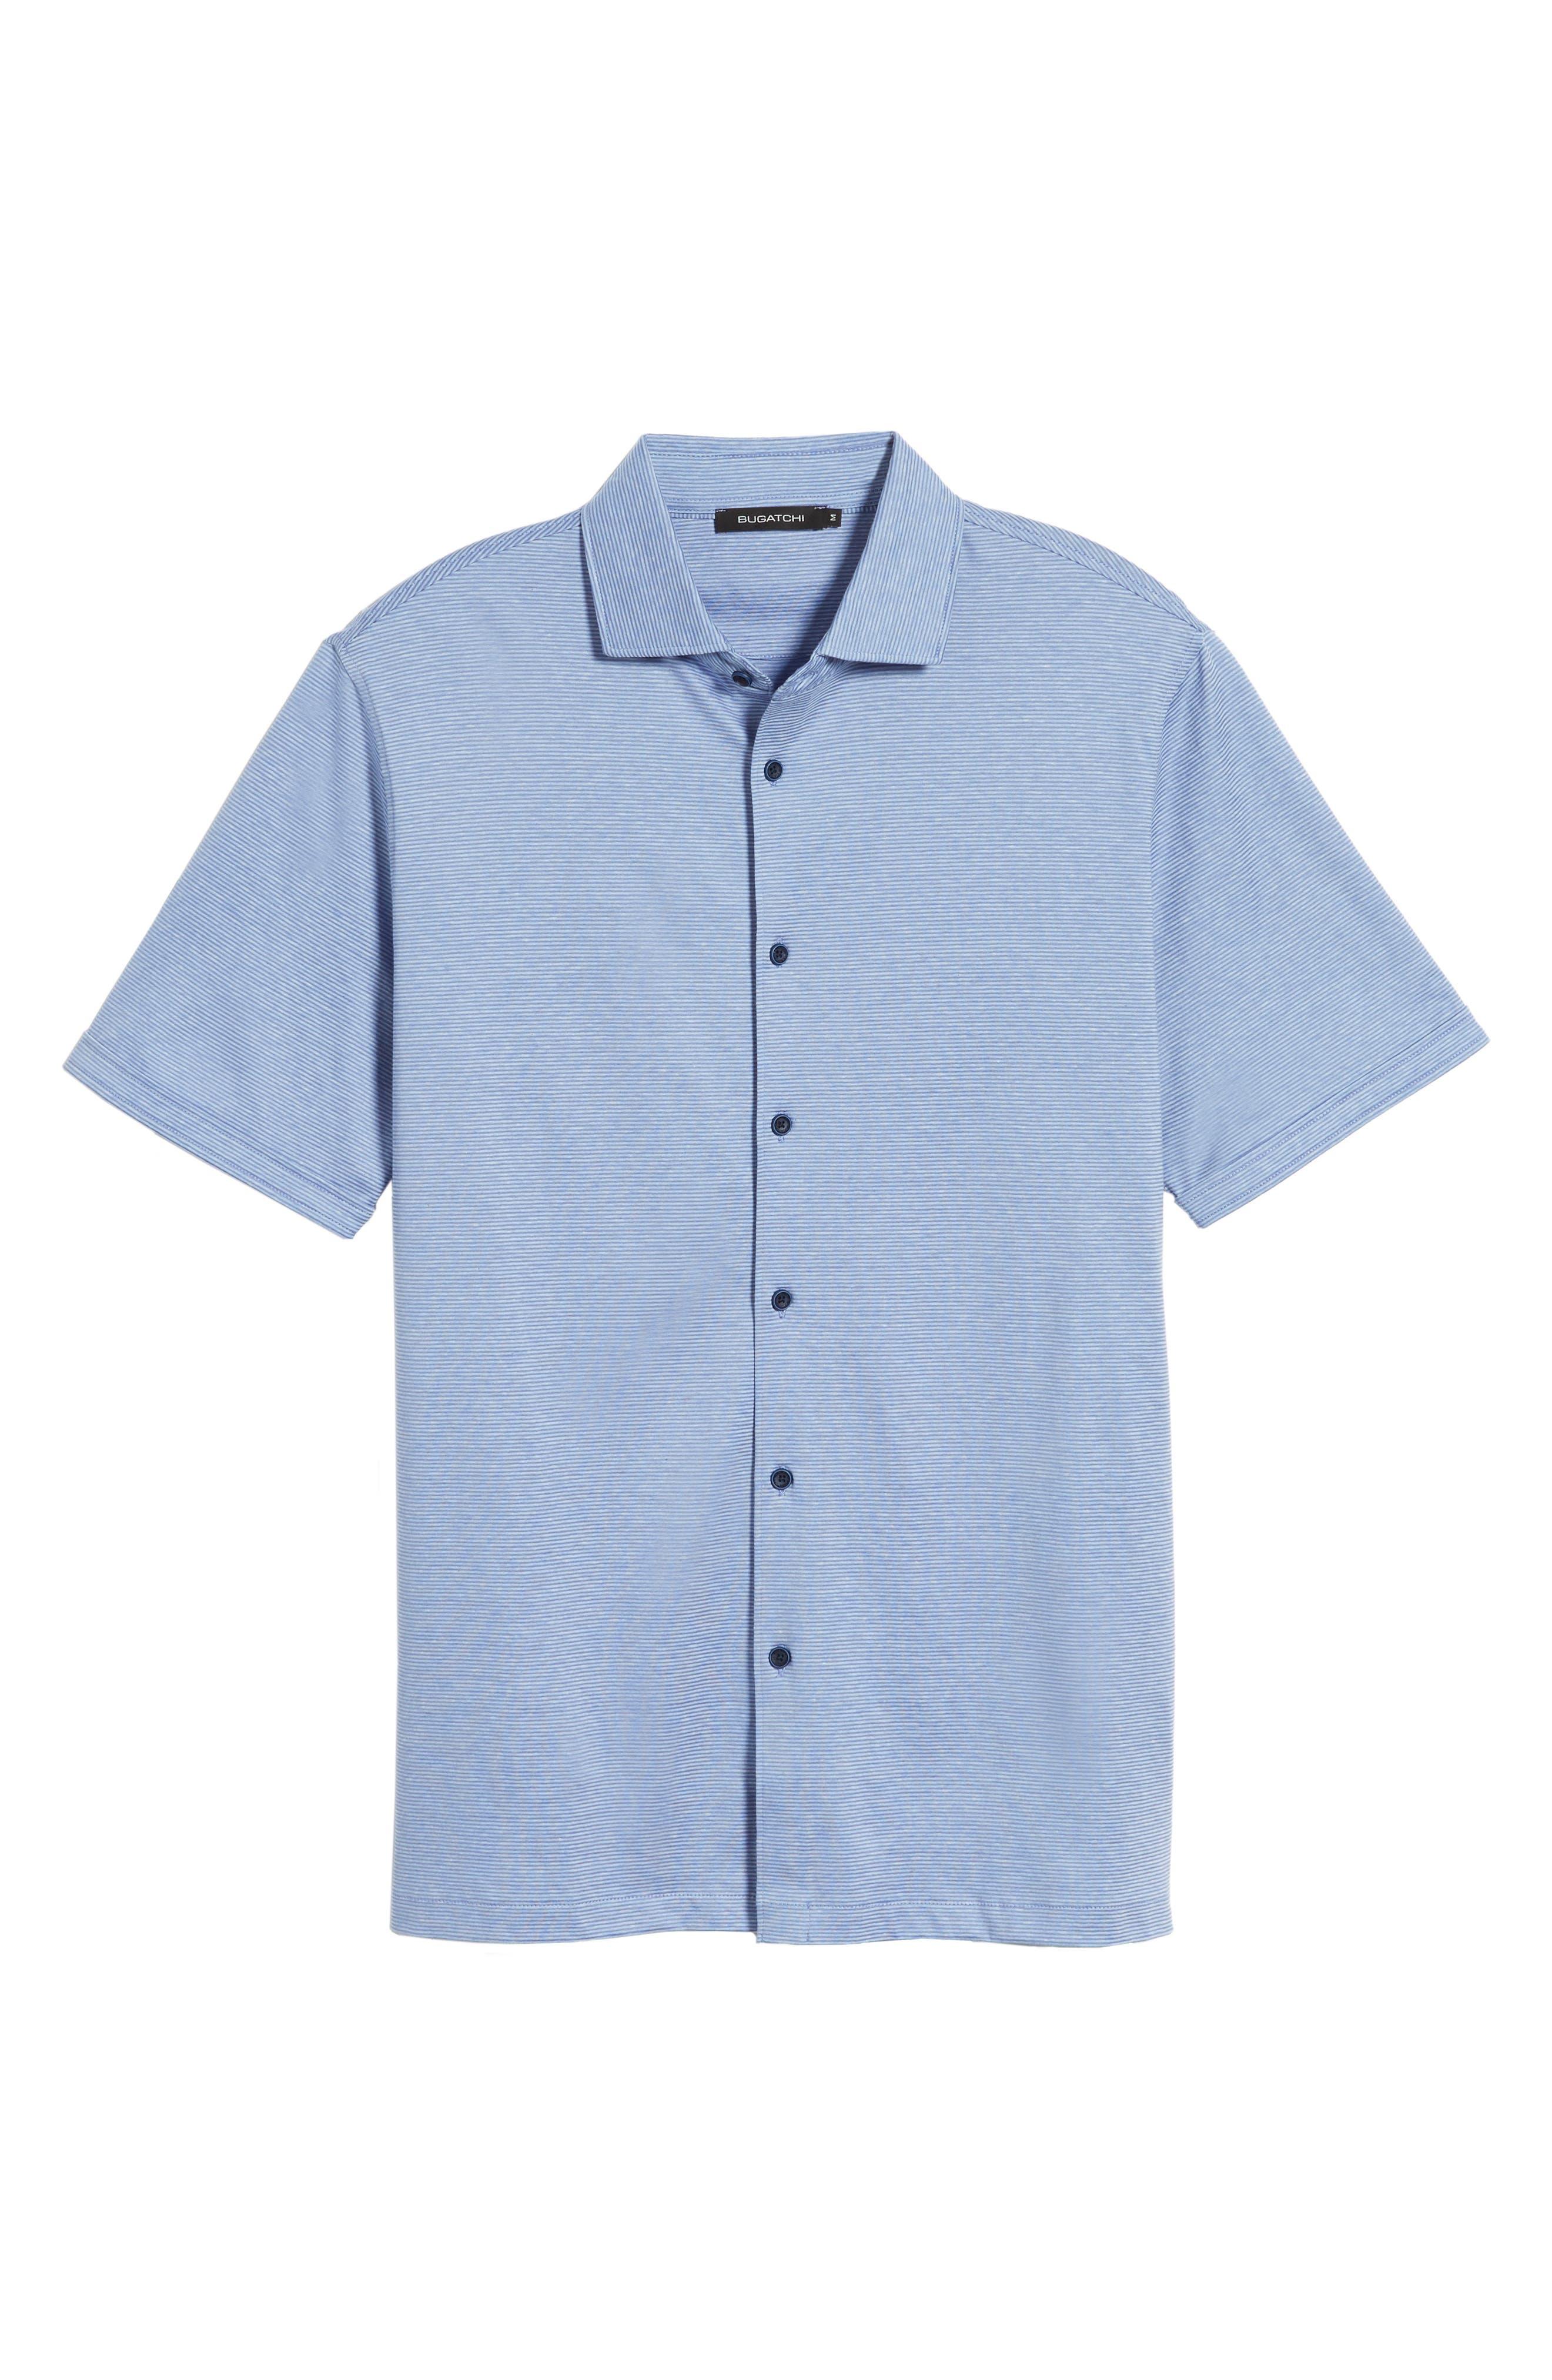 Regular Fit Knit Sport Shirt,                             Alternate thumbnail 6, color,                             511